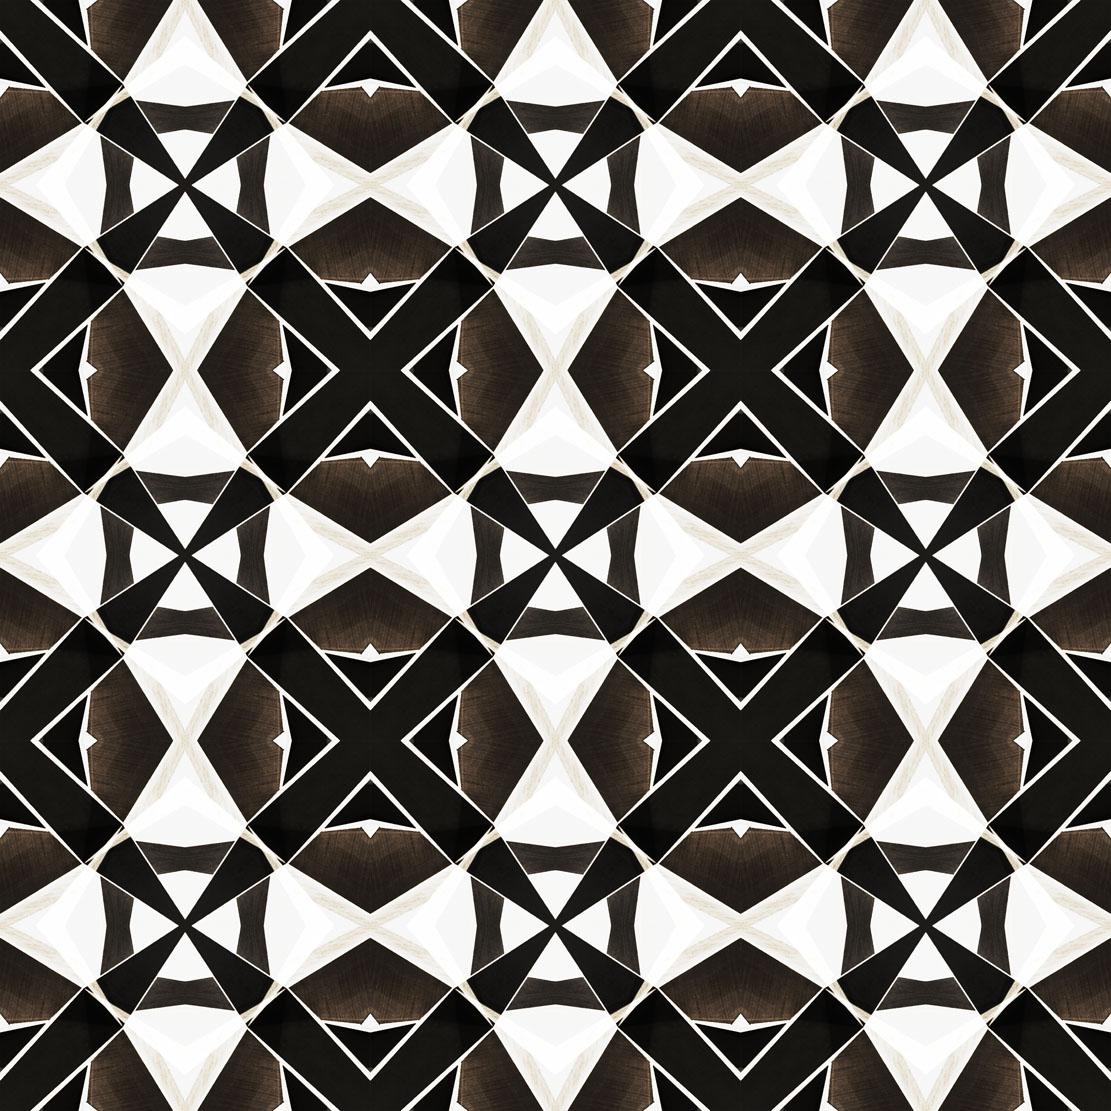 trianglular box_pattern_02.jpg